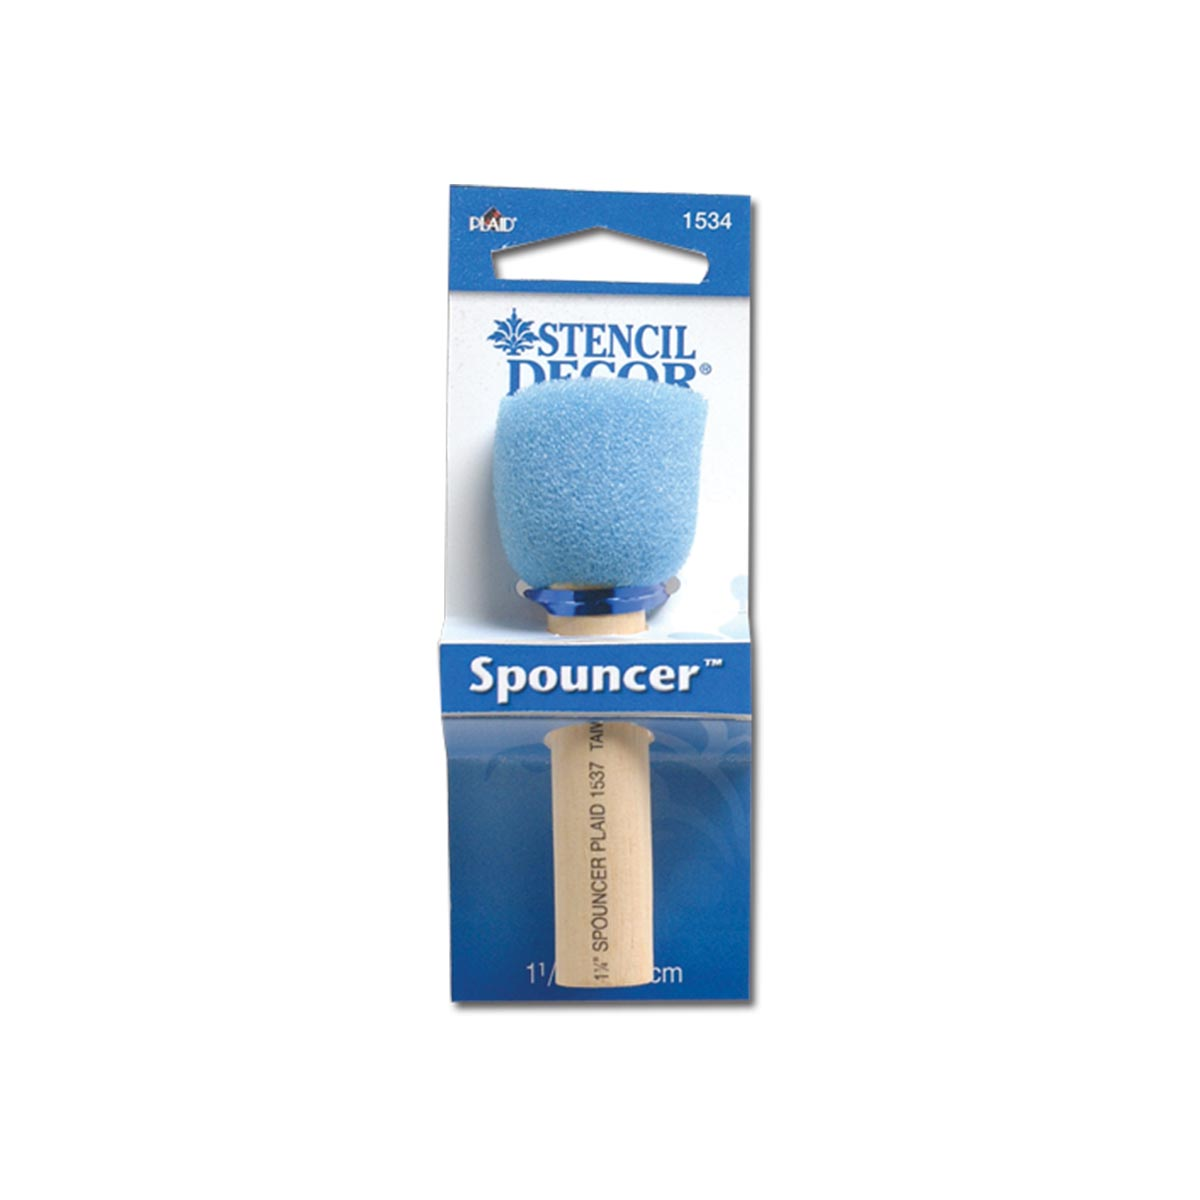 FolkArt ® Painting Tools - Spouncer ® Stenciling Sponge - Medium - 1534